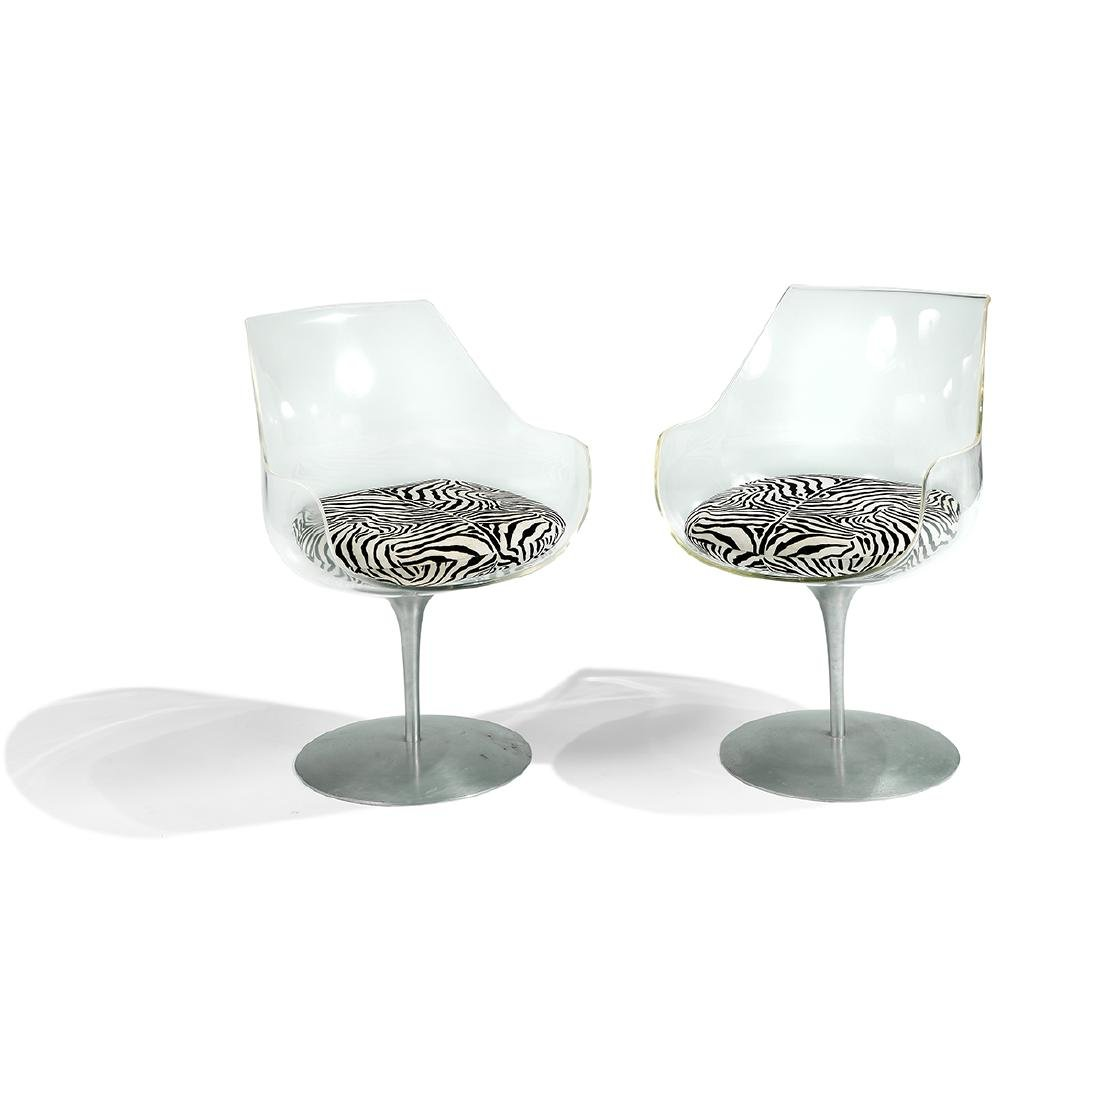 Erwine & Estelle Laverne Champagne chairs, pair